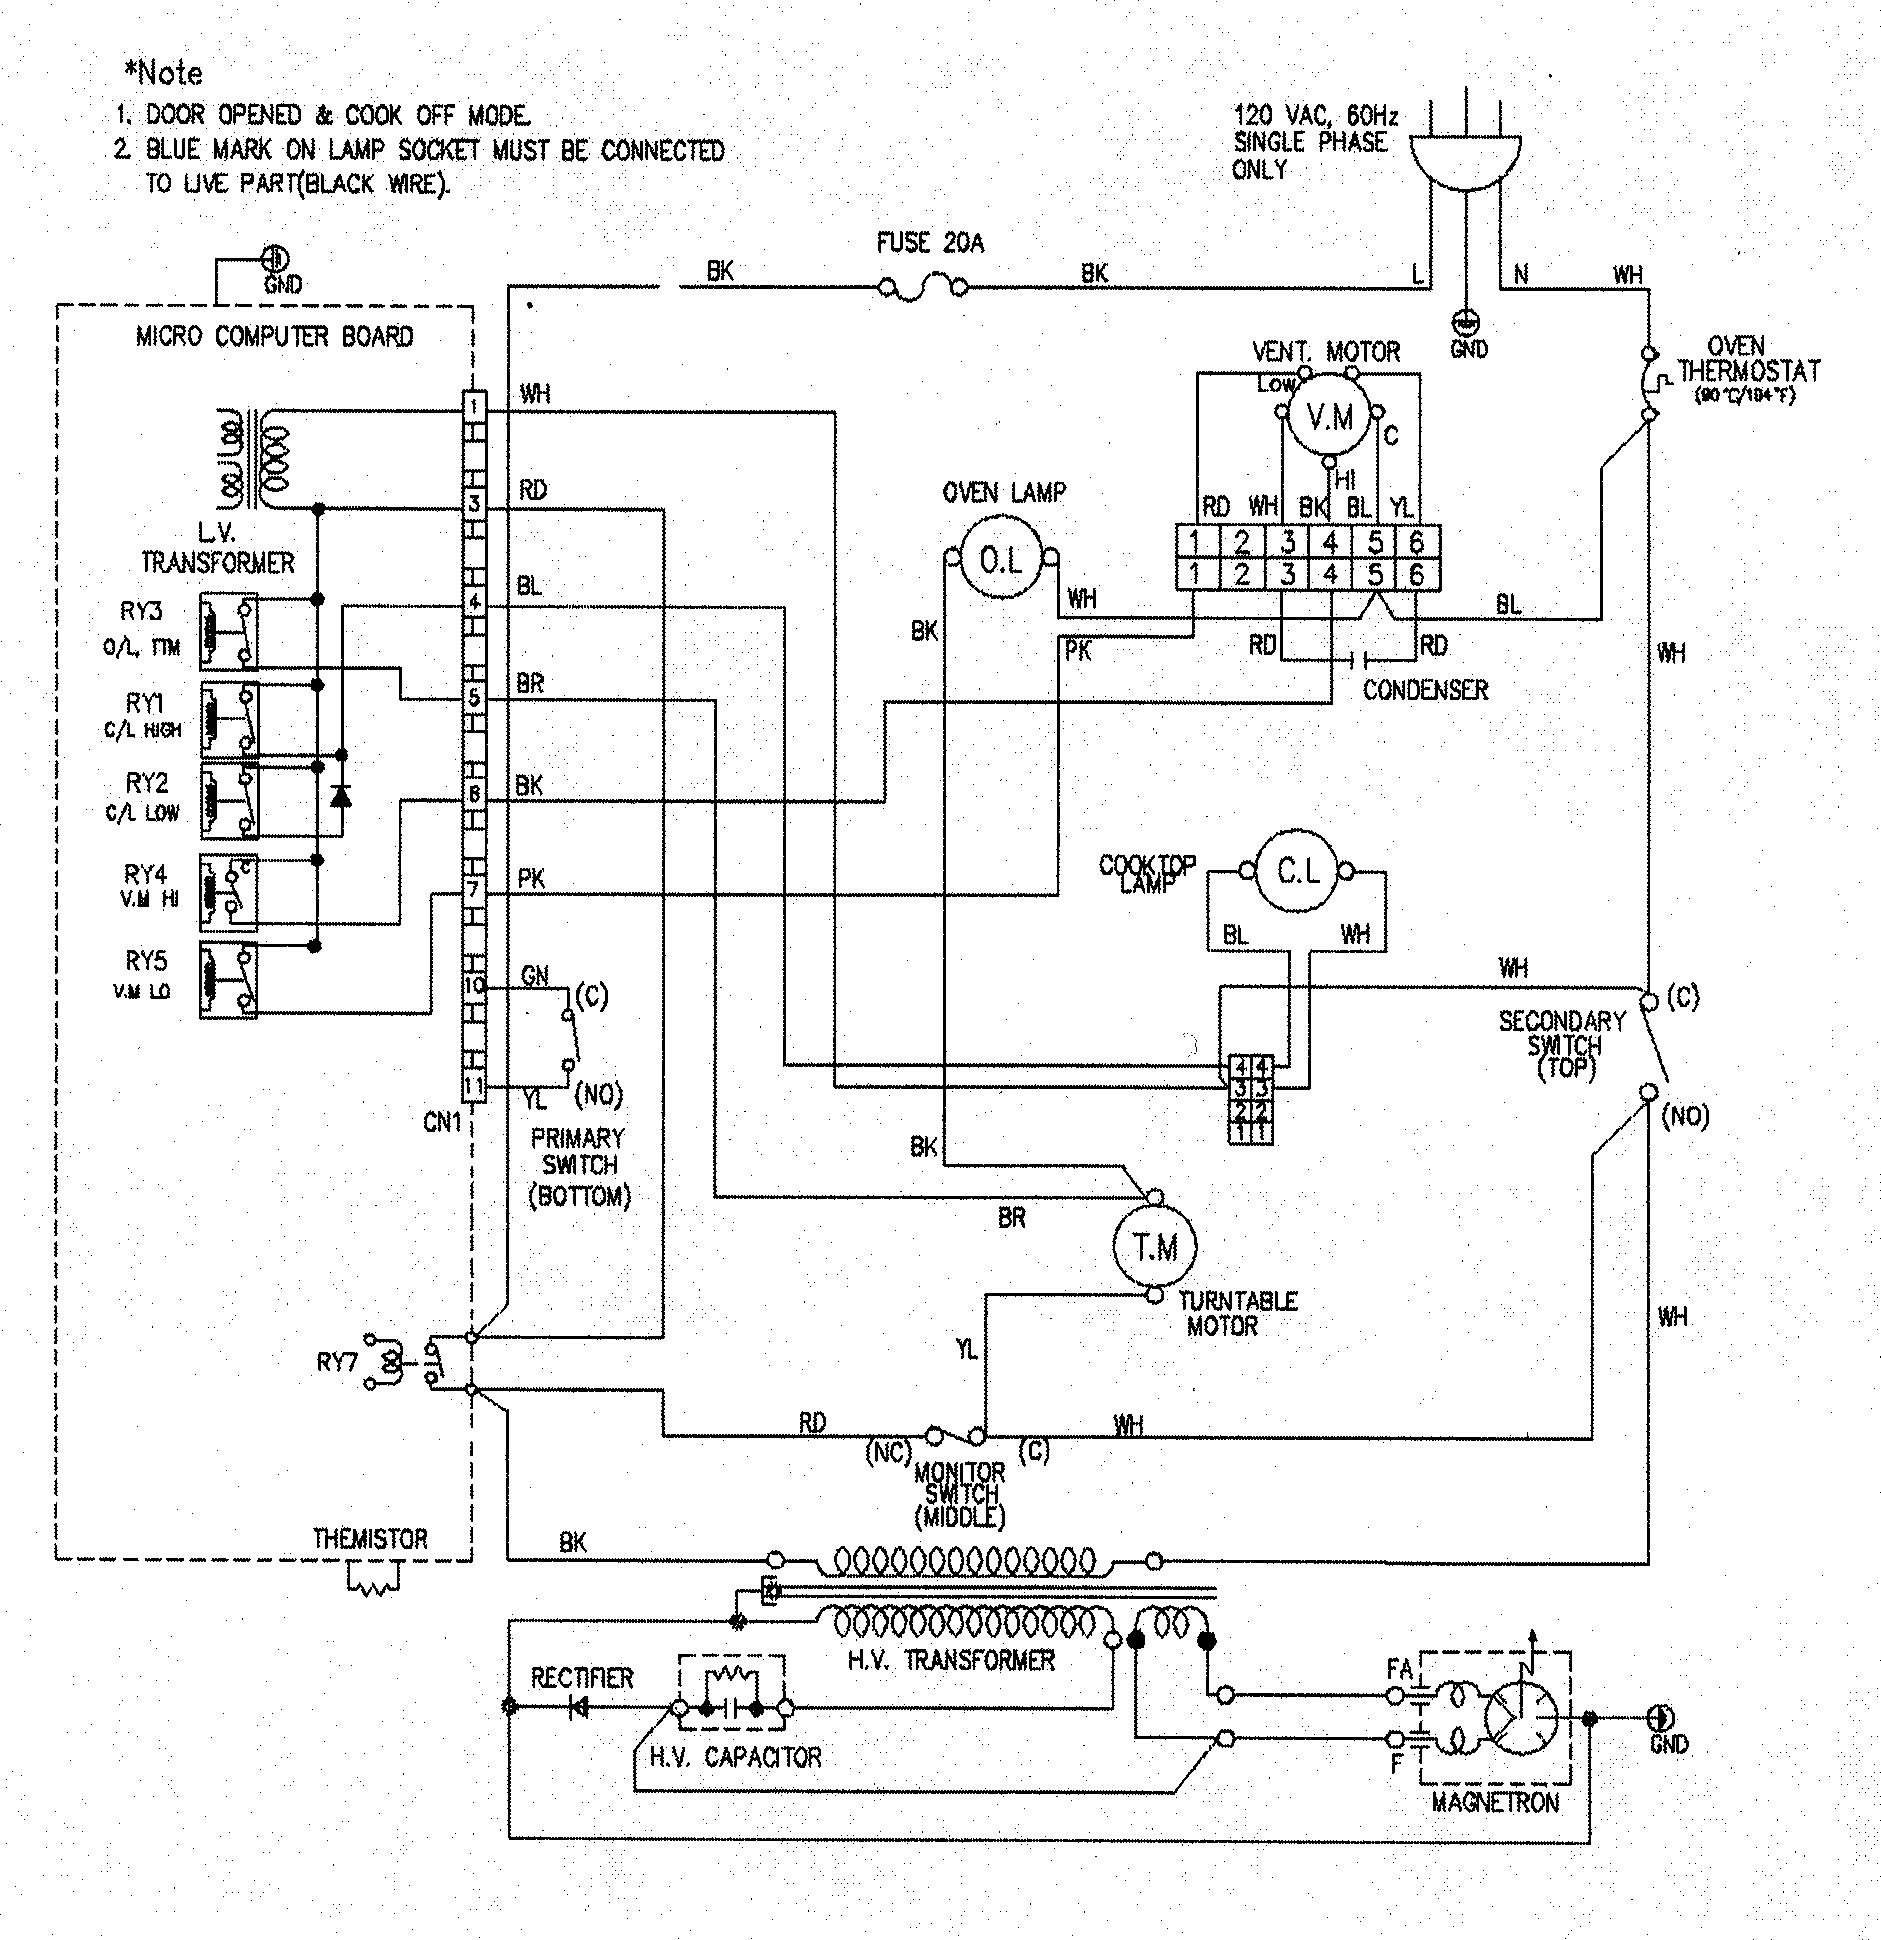 Ge Spectra Electric Range Wiring Diagram - 2001 Toyota 4runner Trailer  Wiring - landrovers.nescafe.jeanjaures37.fr | Ge Spectra Wiring Diagram |  | Wiring Diagram Resource